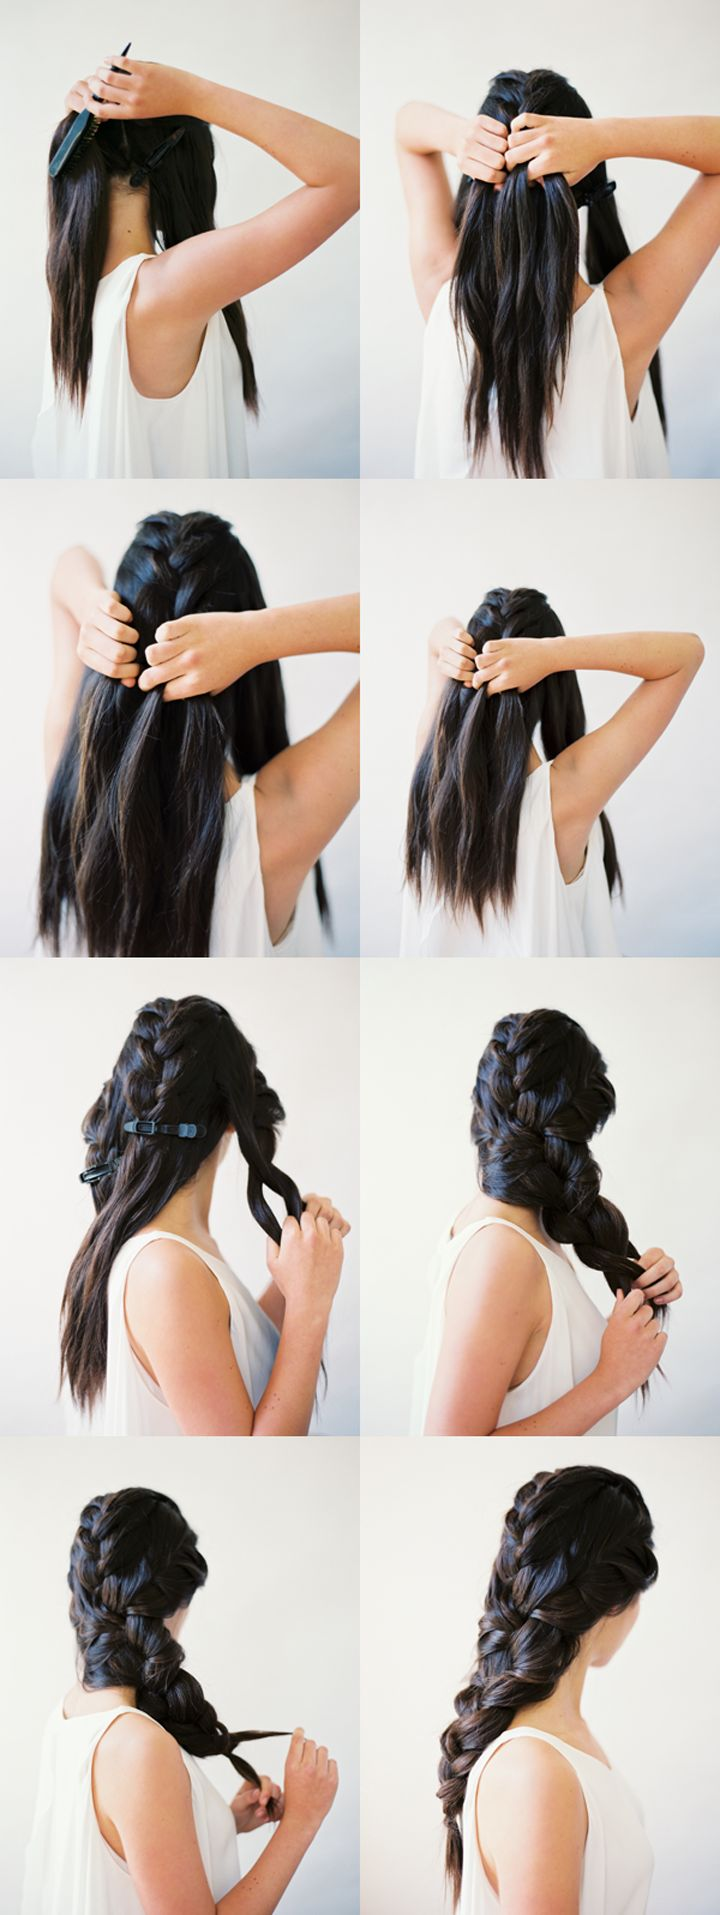 DIY - Beautiful Big Braid - Step by Step Hair Tutorial